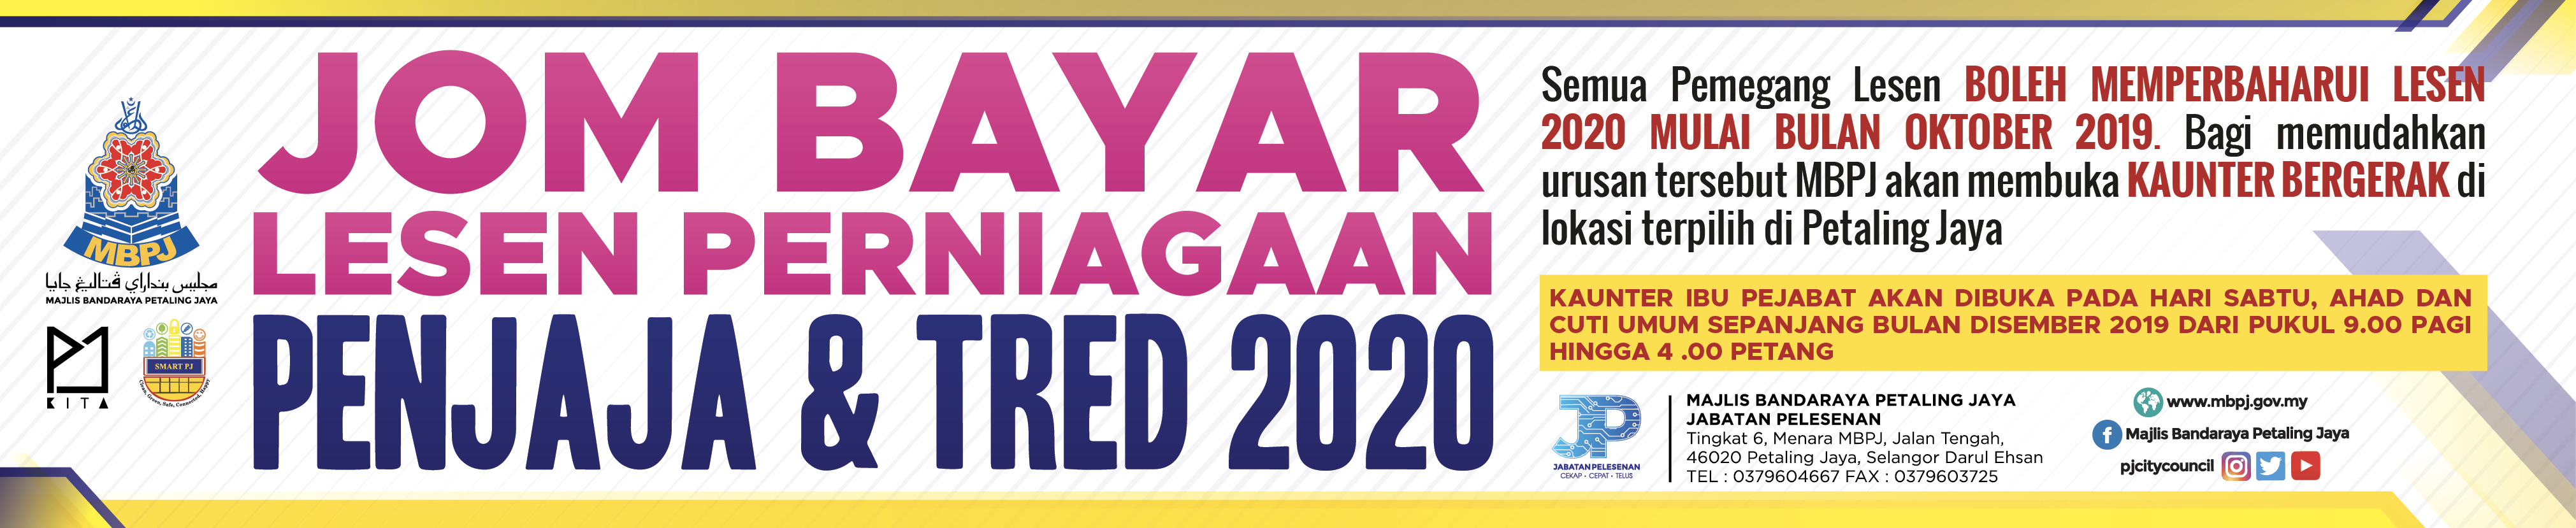 Banner Jom Bayar Lesen 2020